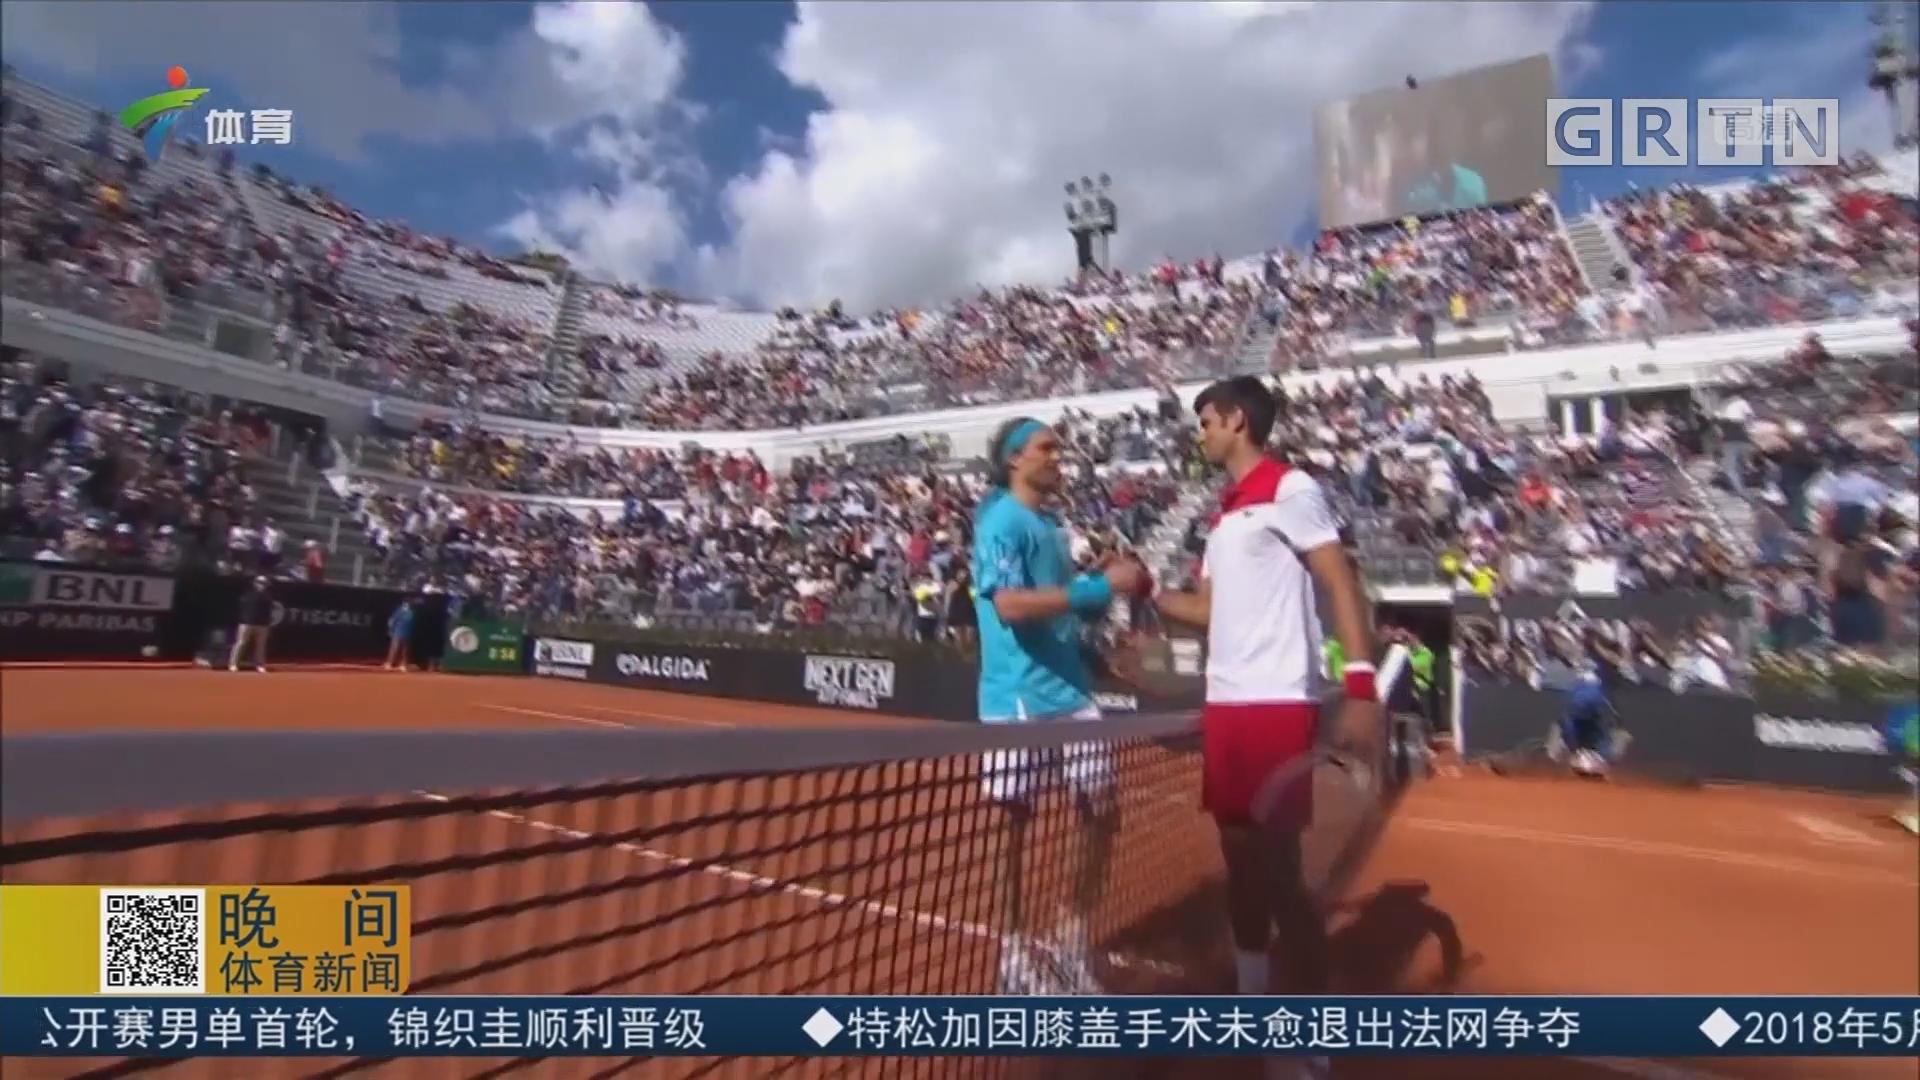 ATP罗马大师赛 德约科维奇轻松晋级次轮